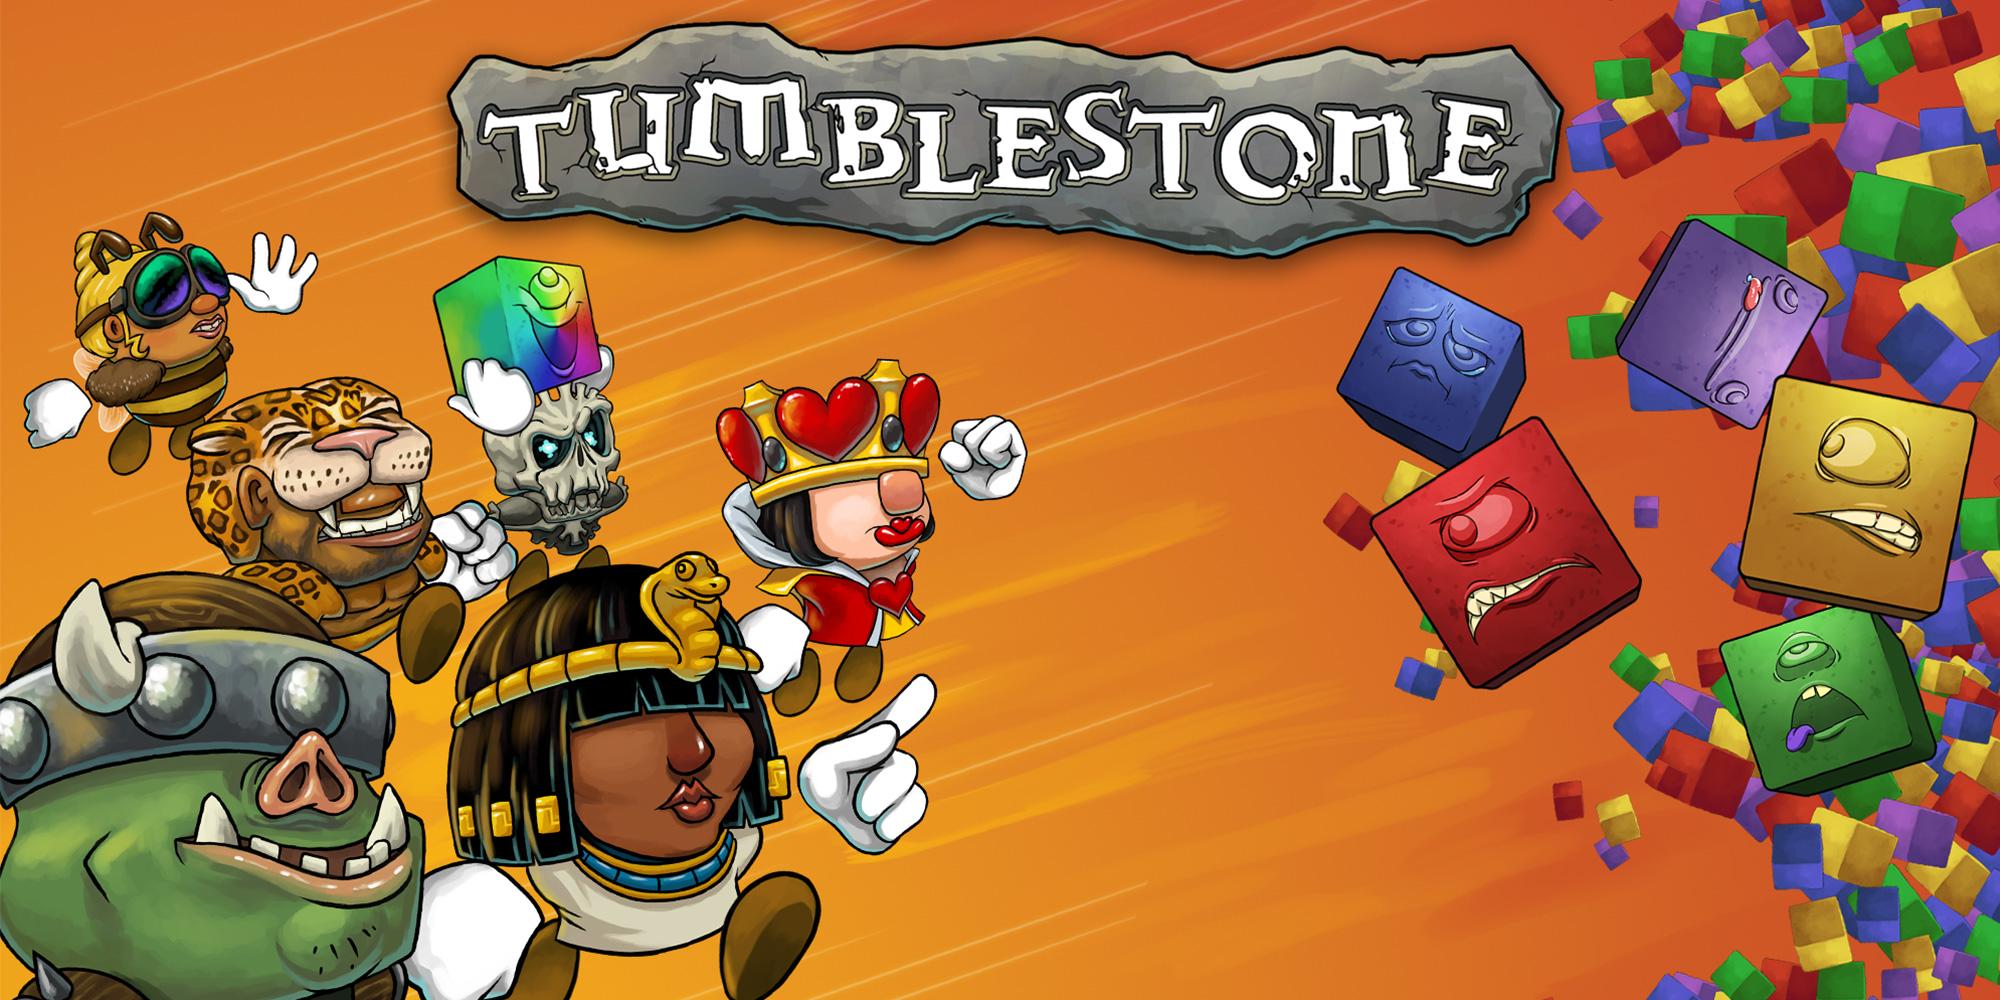 Wii U Downloadable Games : Tumblestone wii u download software games nintendo